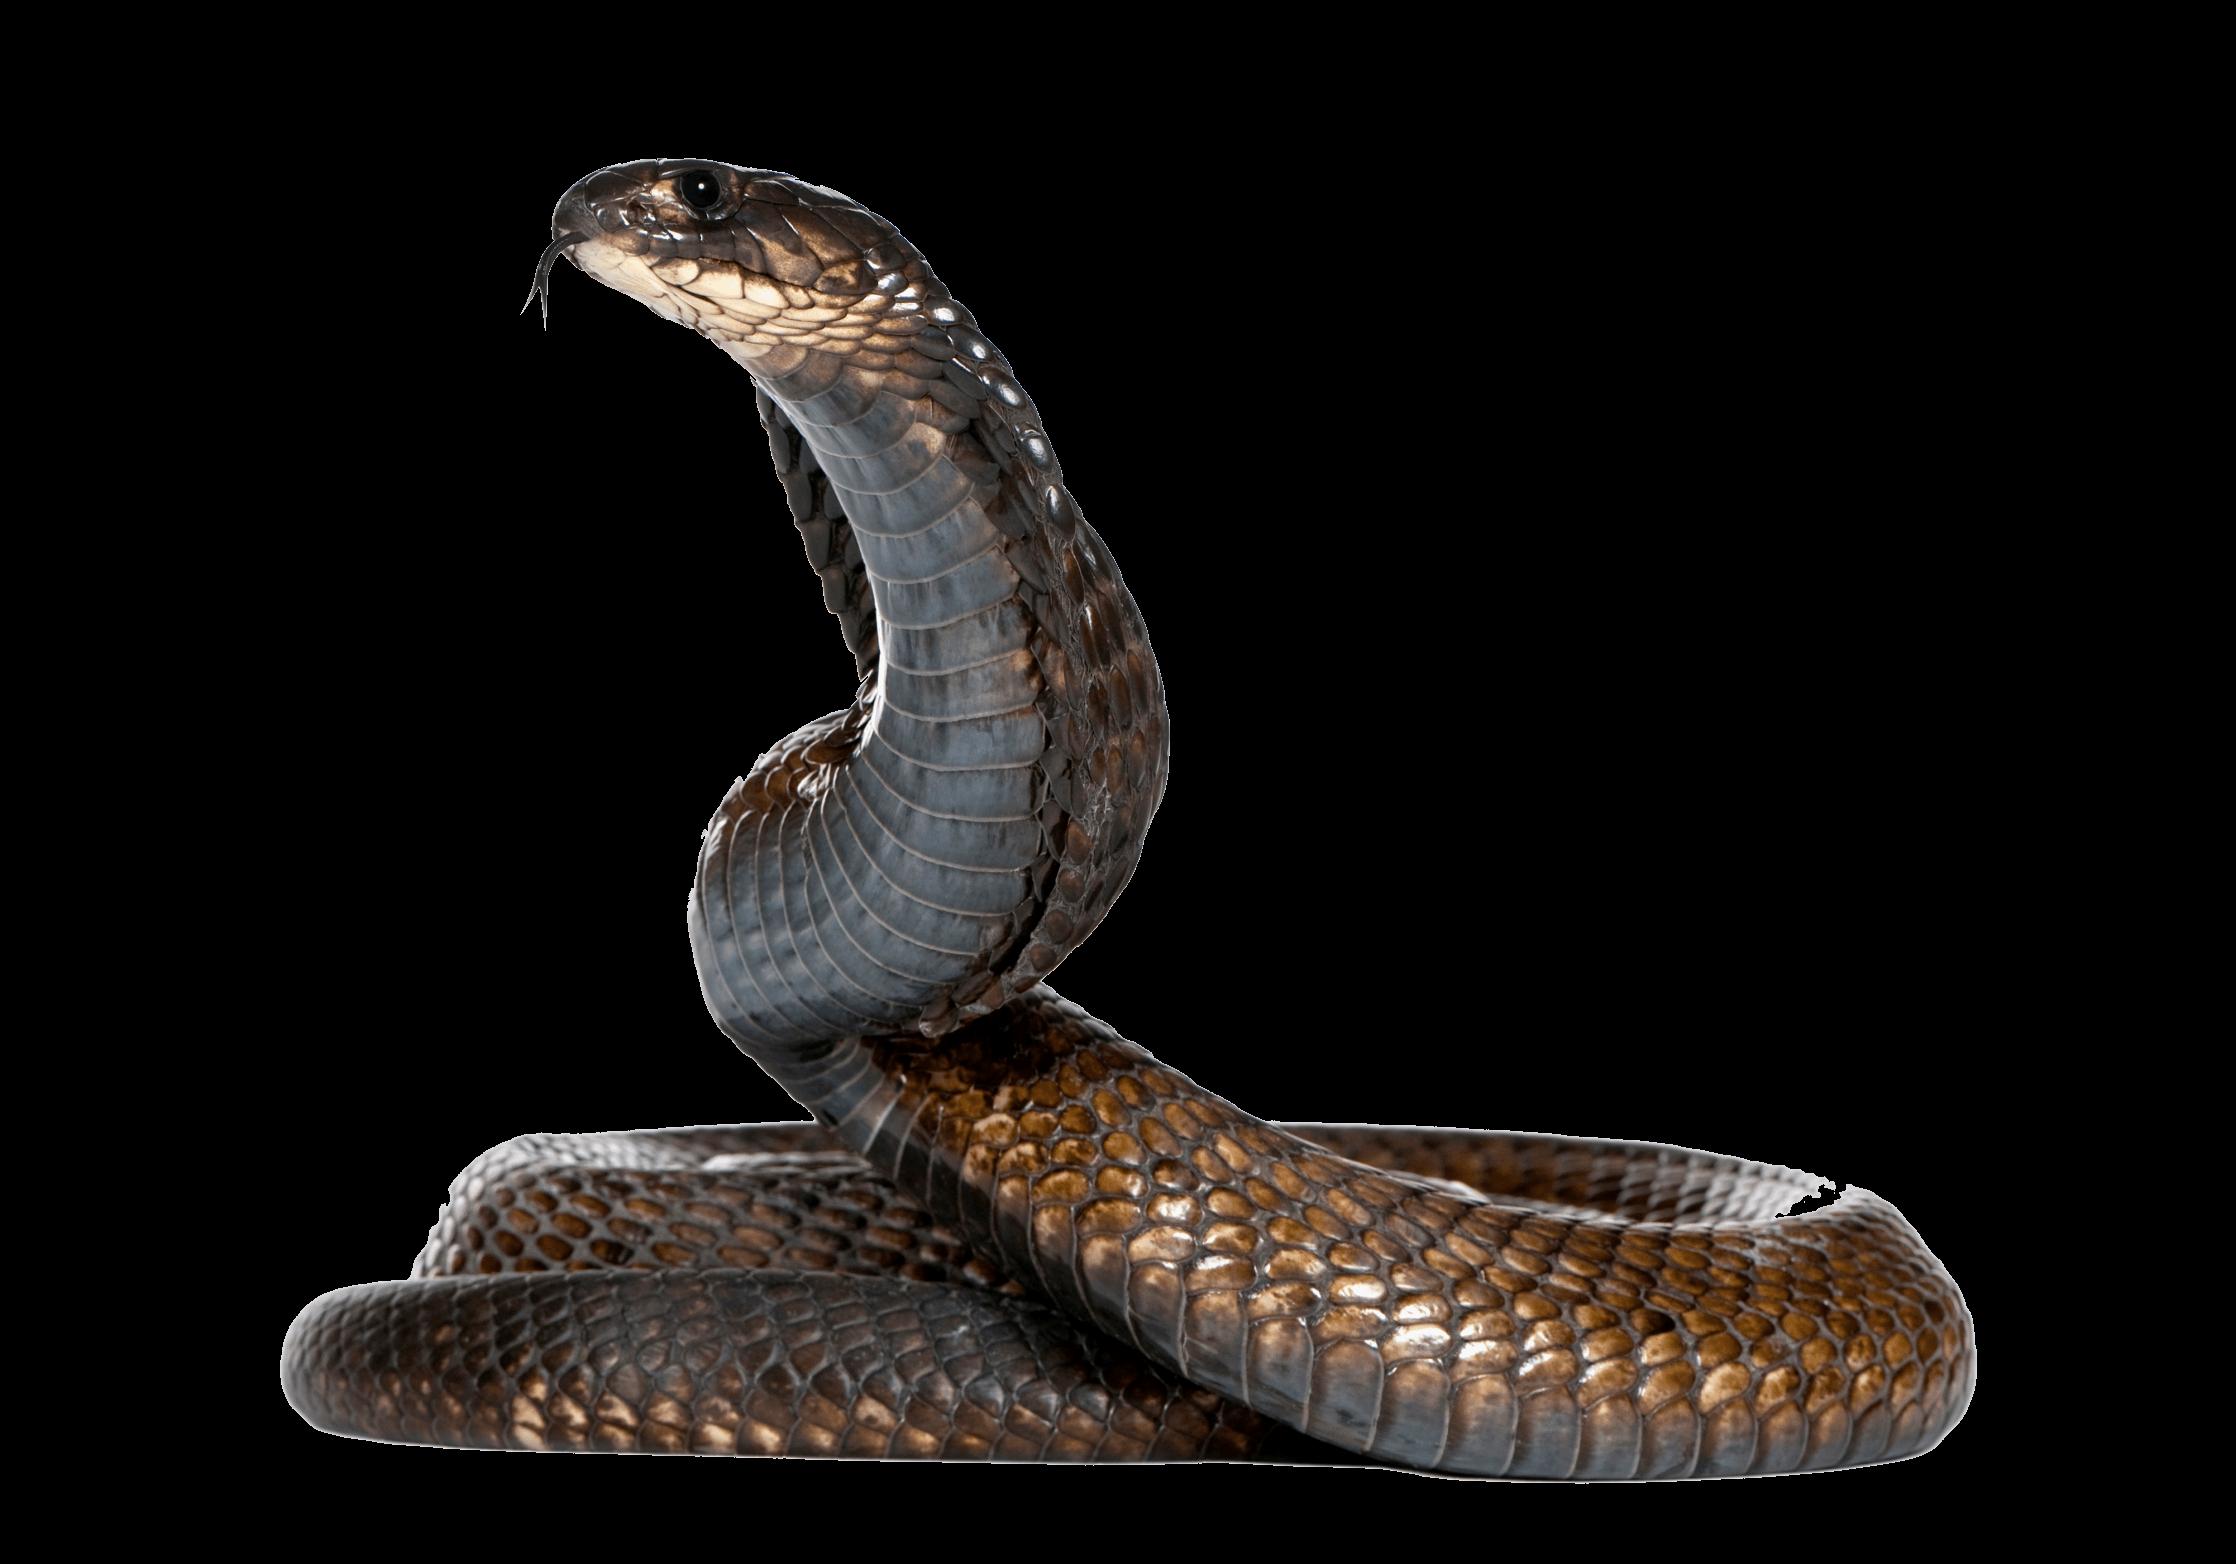 Cobra Snake Png Image PNG Image - Cobra Snake PNG HD